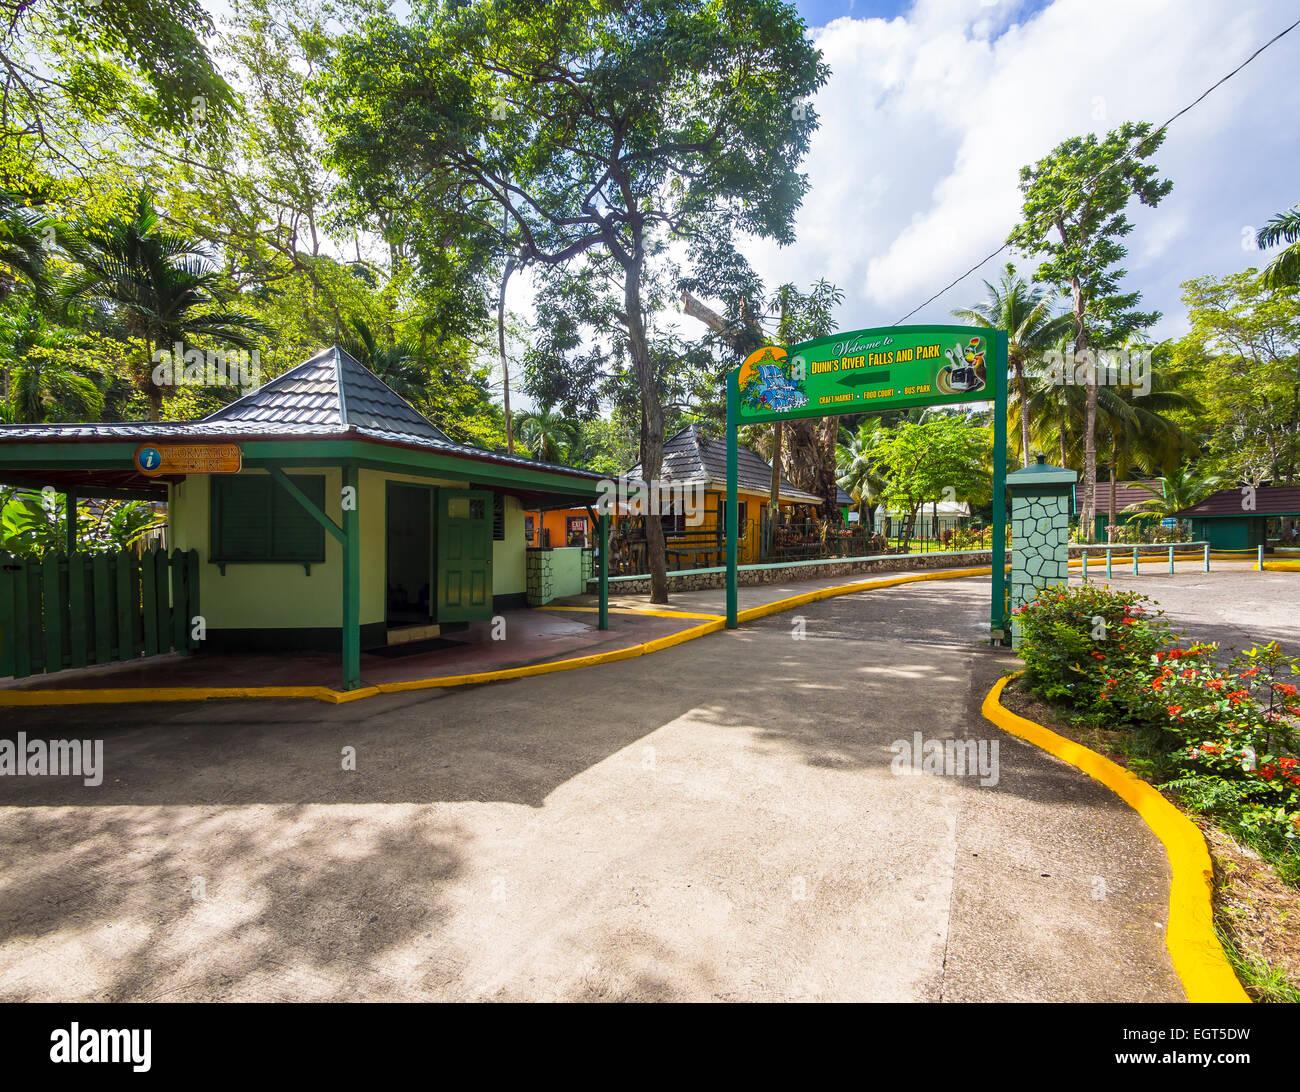 Entrance to the Dunn's River Falls, Ocho Rios, Saint Ann Parish, Jamaica - Stock Image